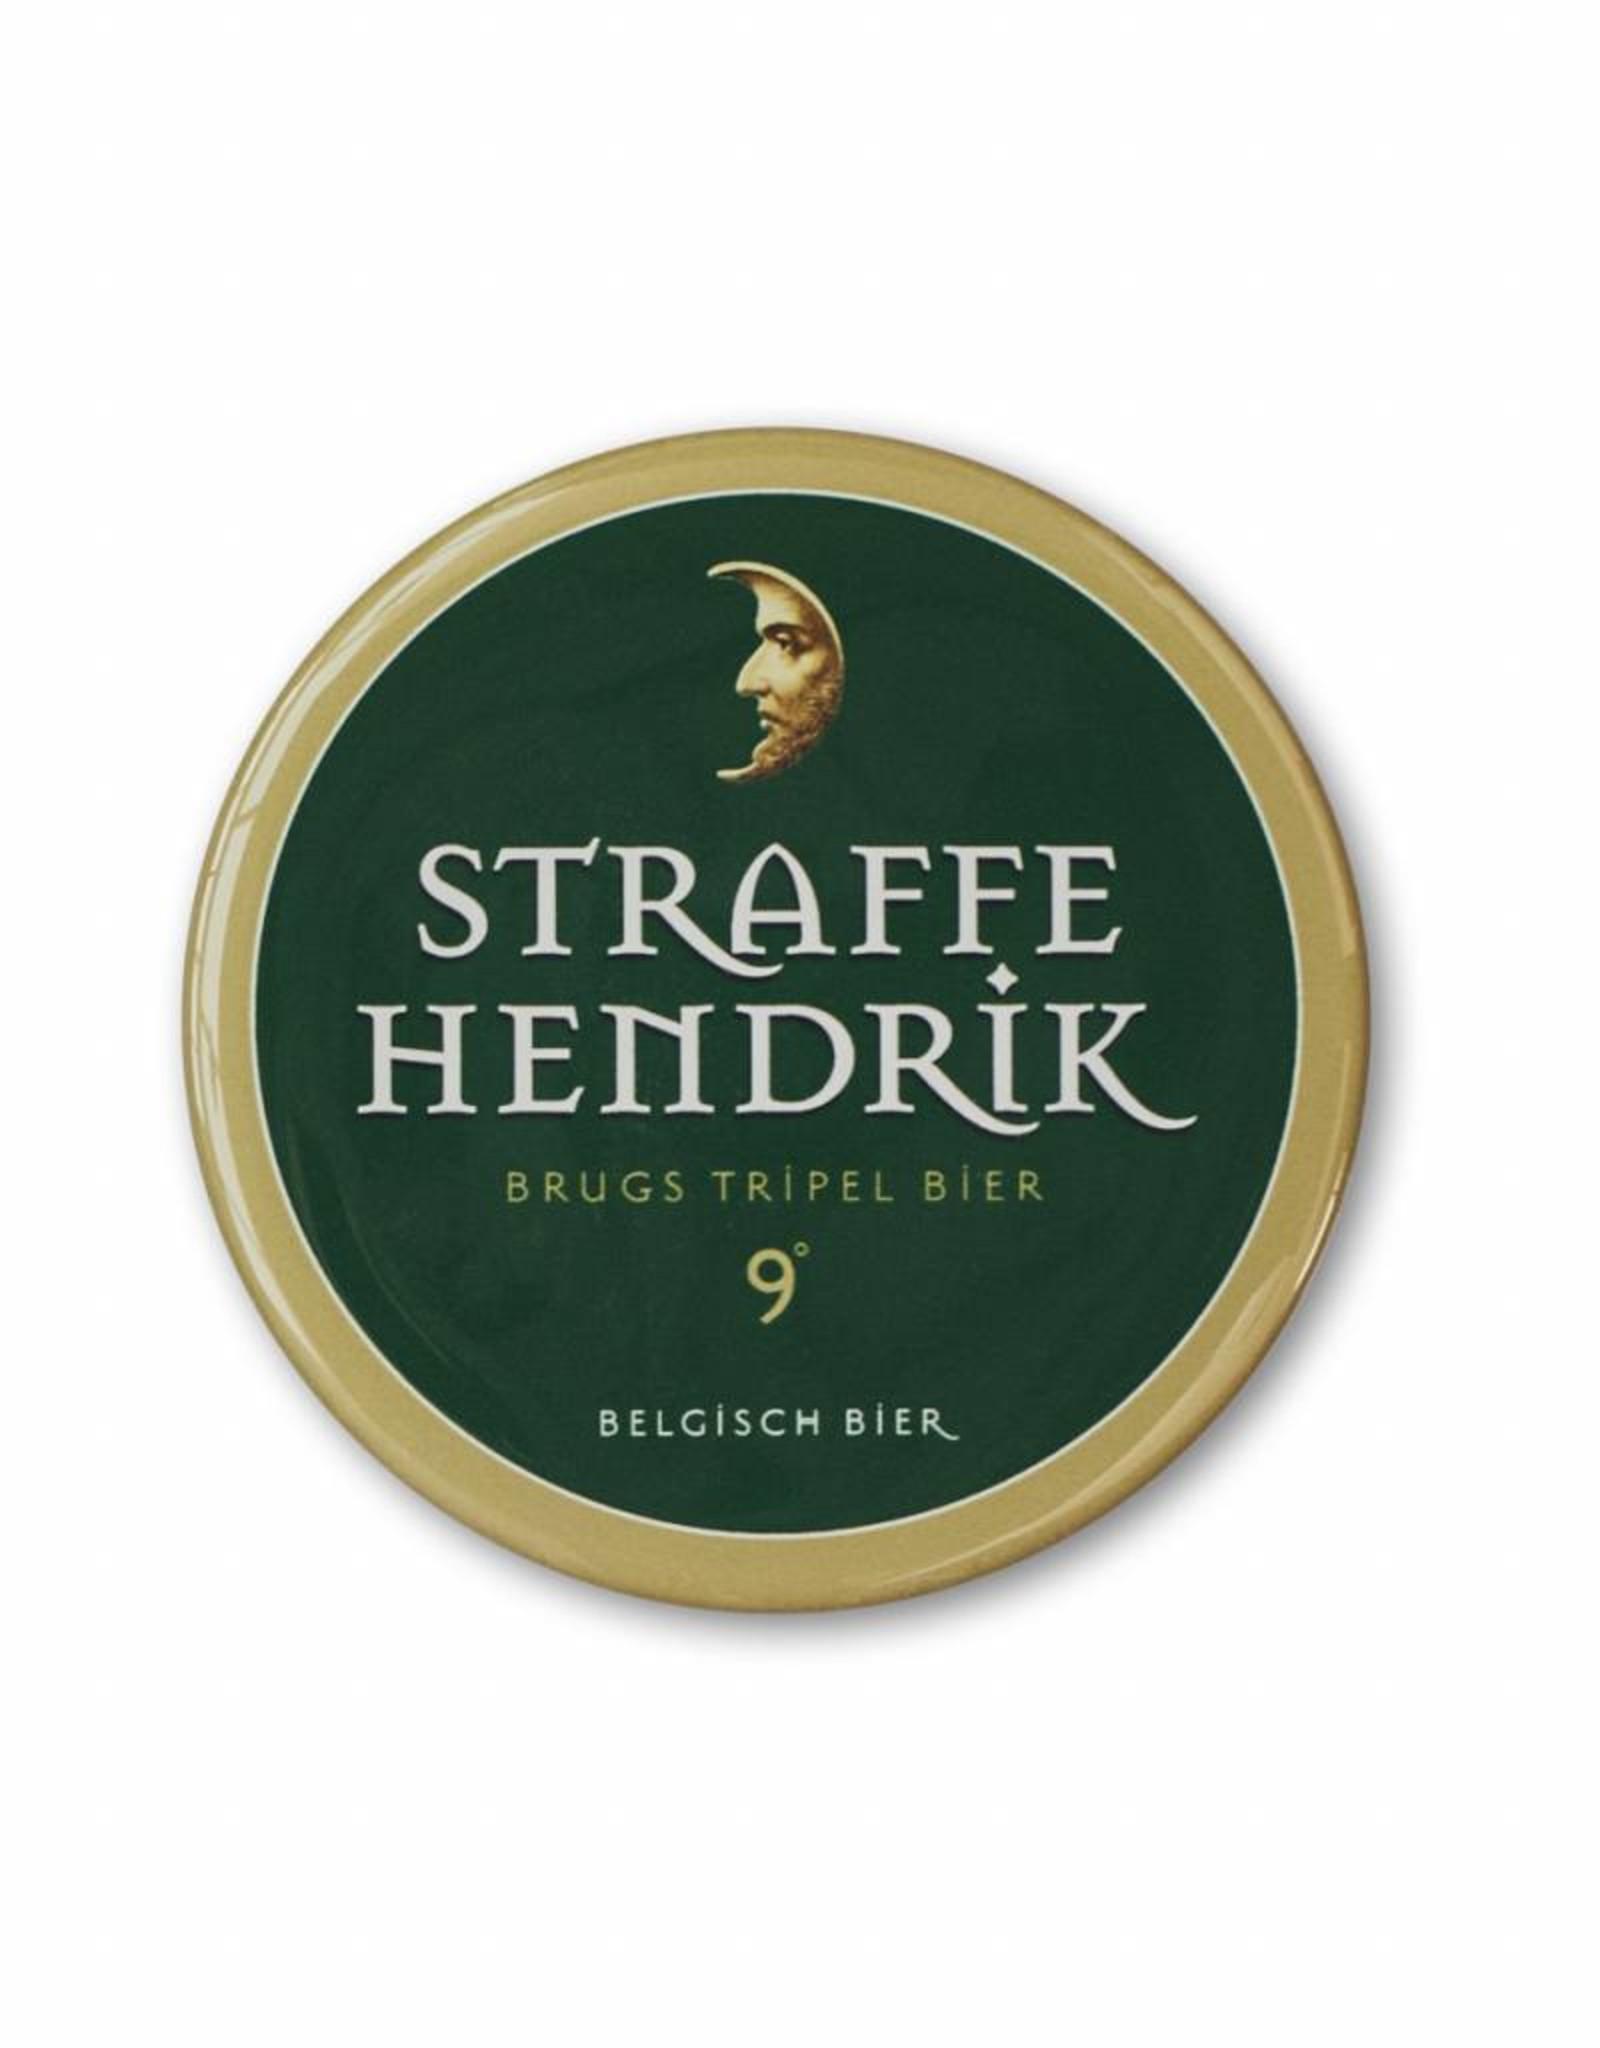 Straffe Hendrink tap handle sticker